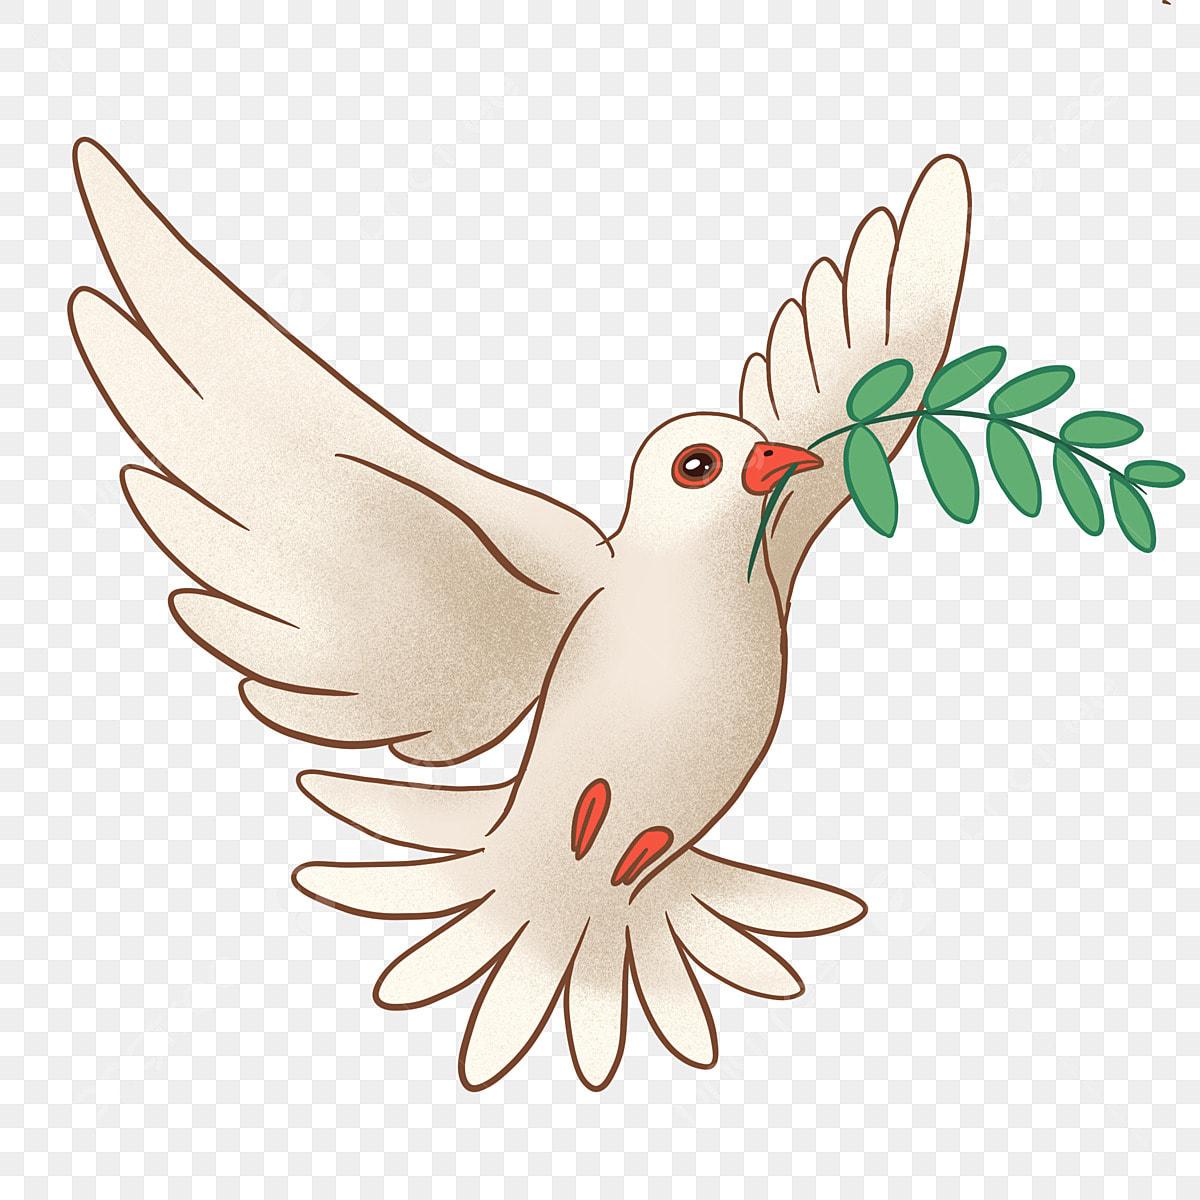 92+  Gambar Burung Merpati Putih Kartun  Paling Keren Gratis